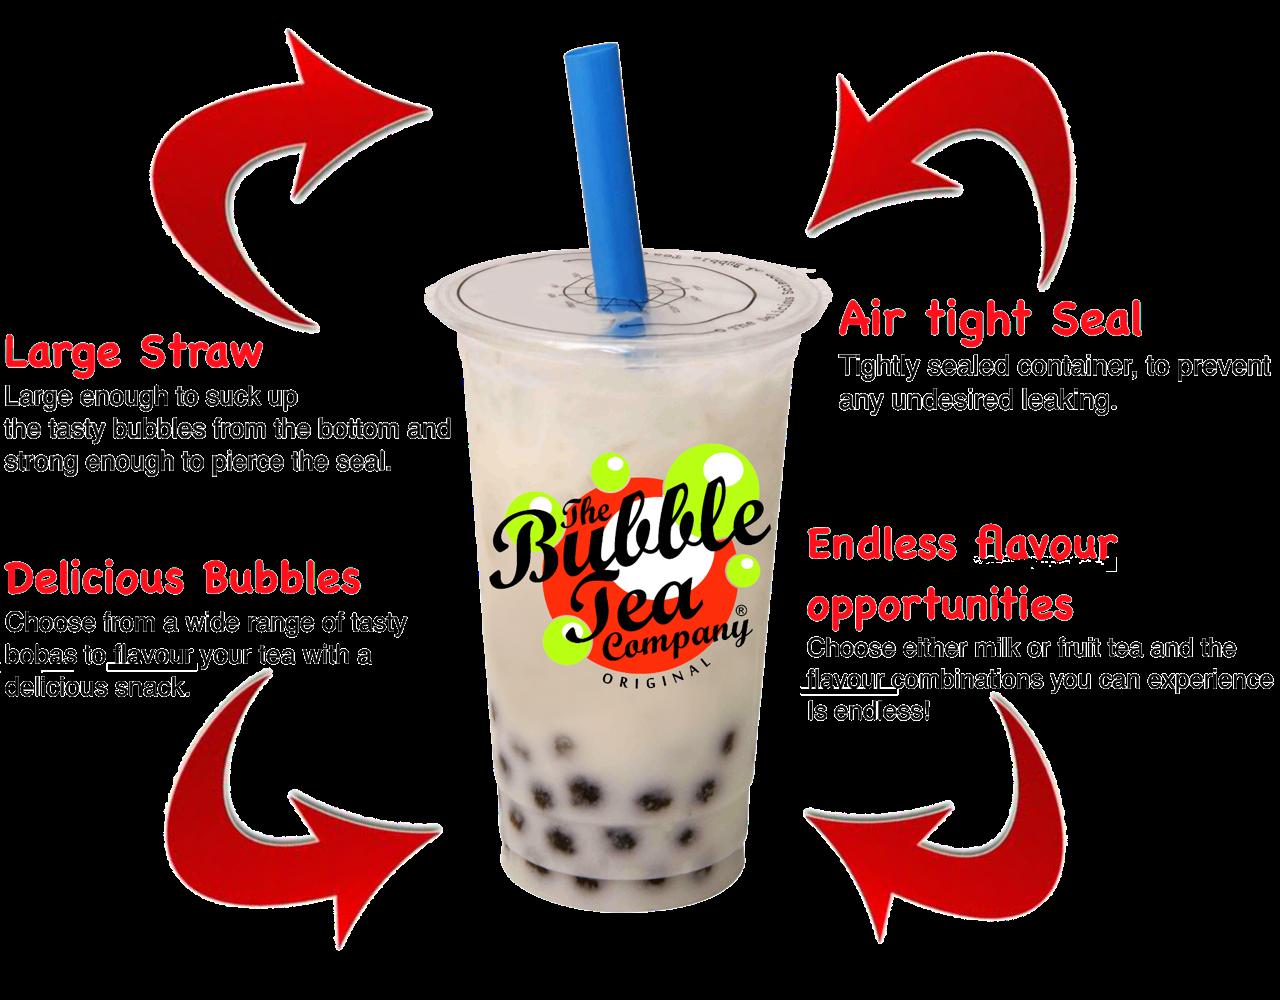 Bubble Tea: My Addiction | BlogHer